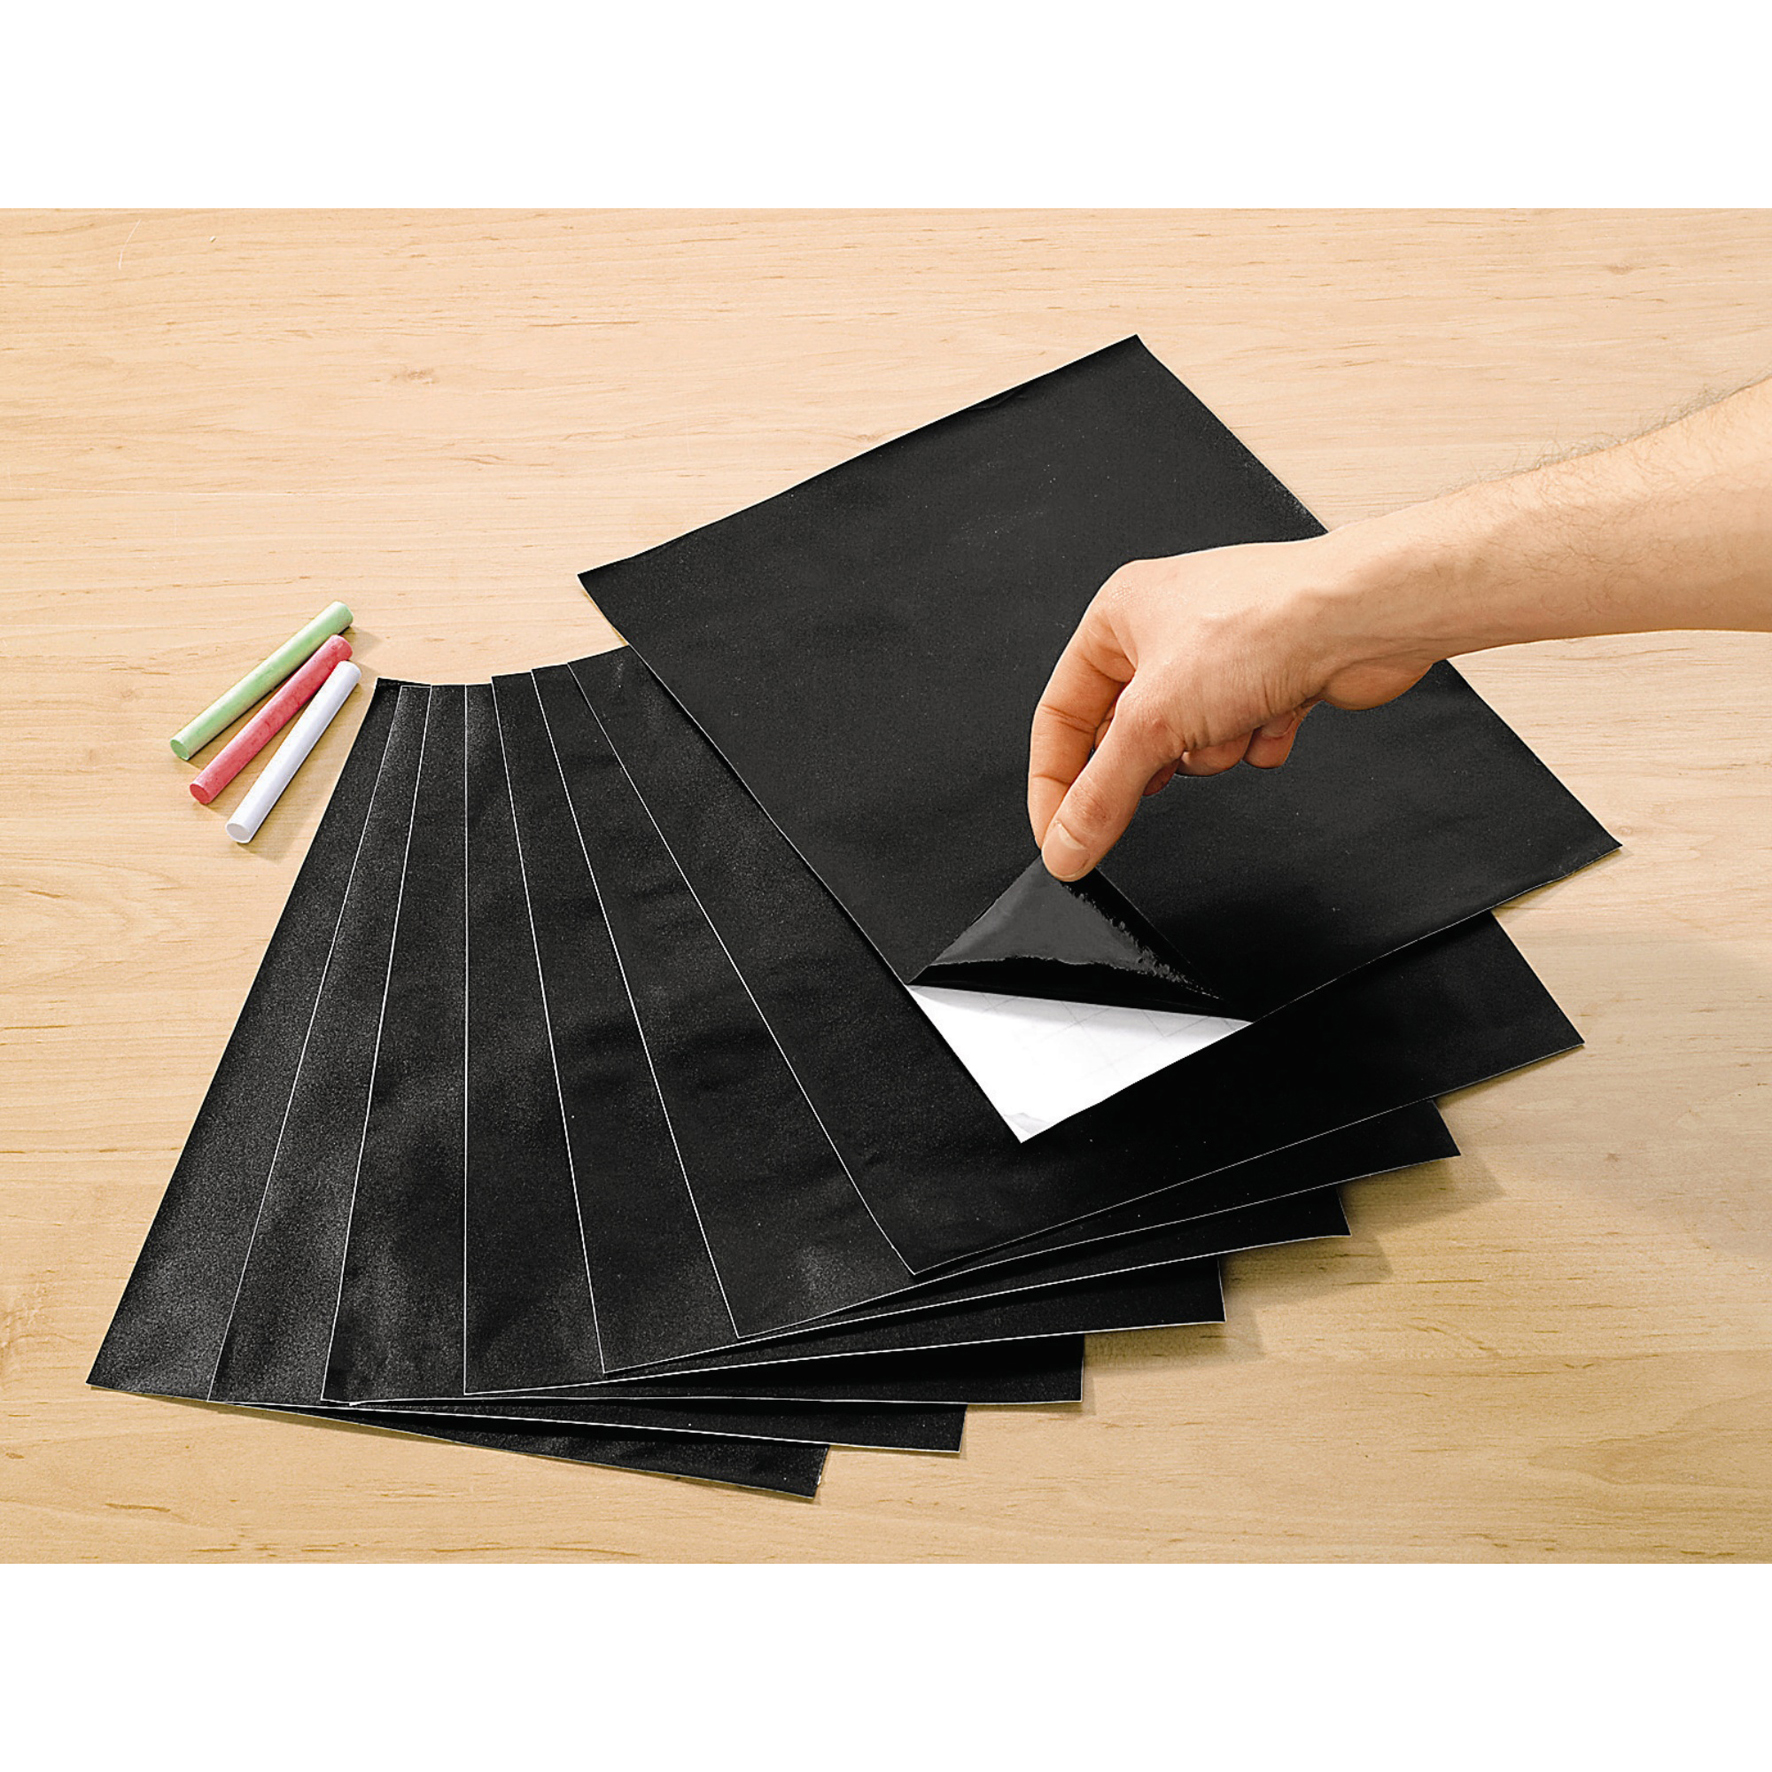 8x tafelfolie je 22x30 cm selbstklebend memoboard wochenplaner tafel maltafel ebay. Black Bedroom Furniture Sets. Home Design Ideas